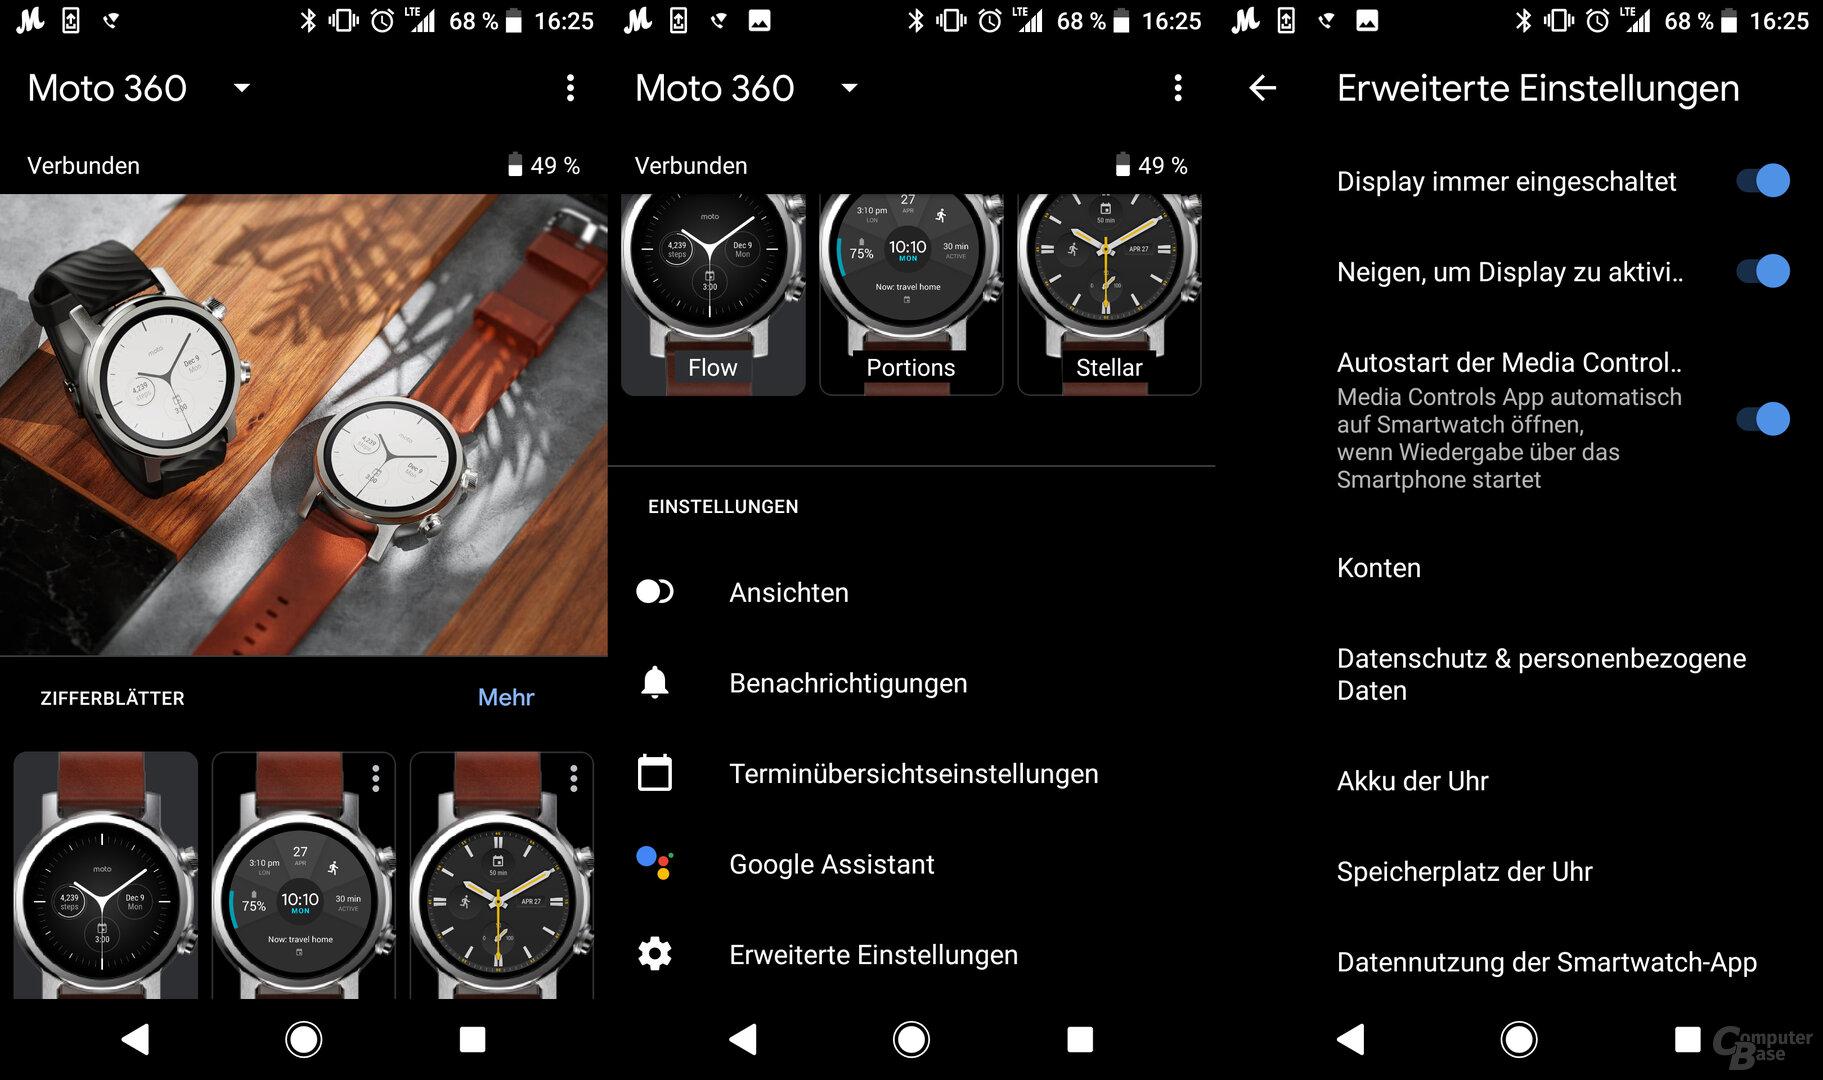 Motorola Moto 360 im Test: Wear OS App